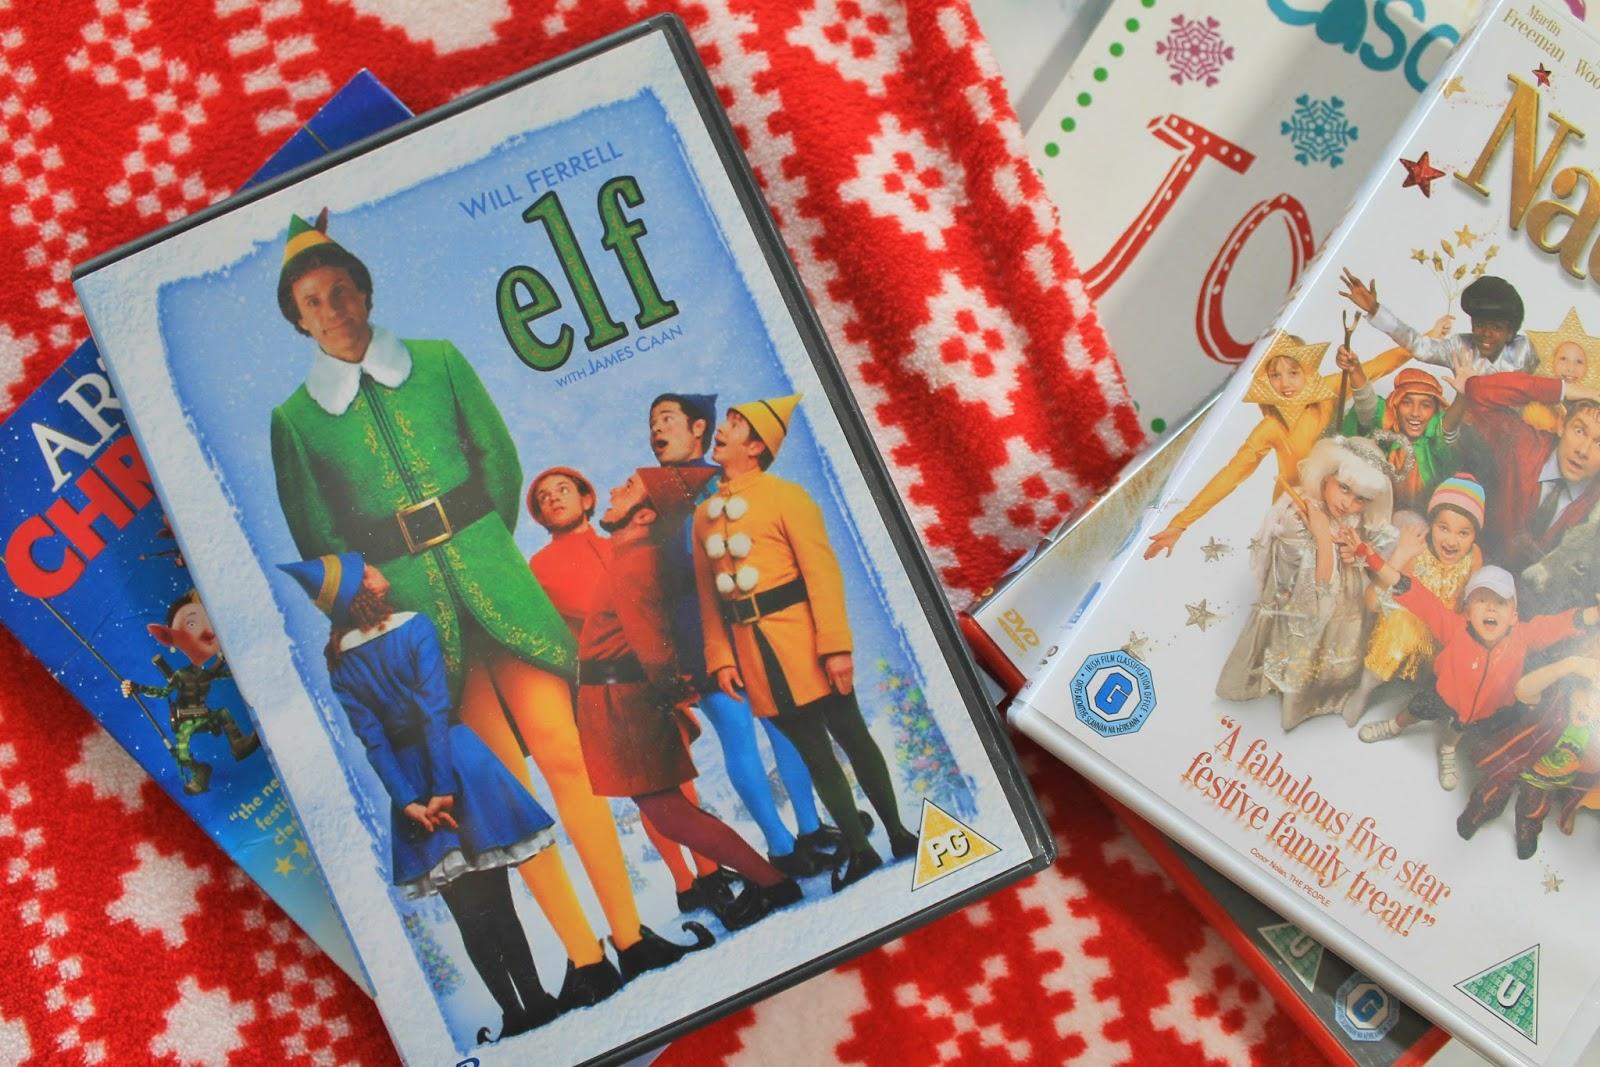 Festive Films 3